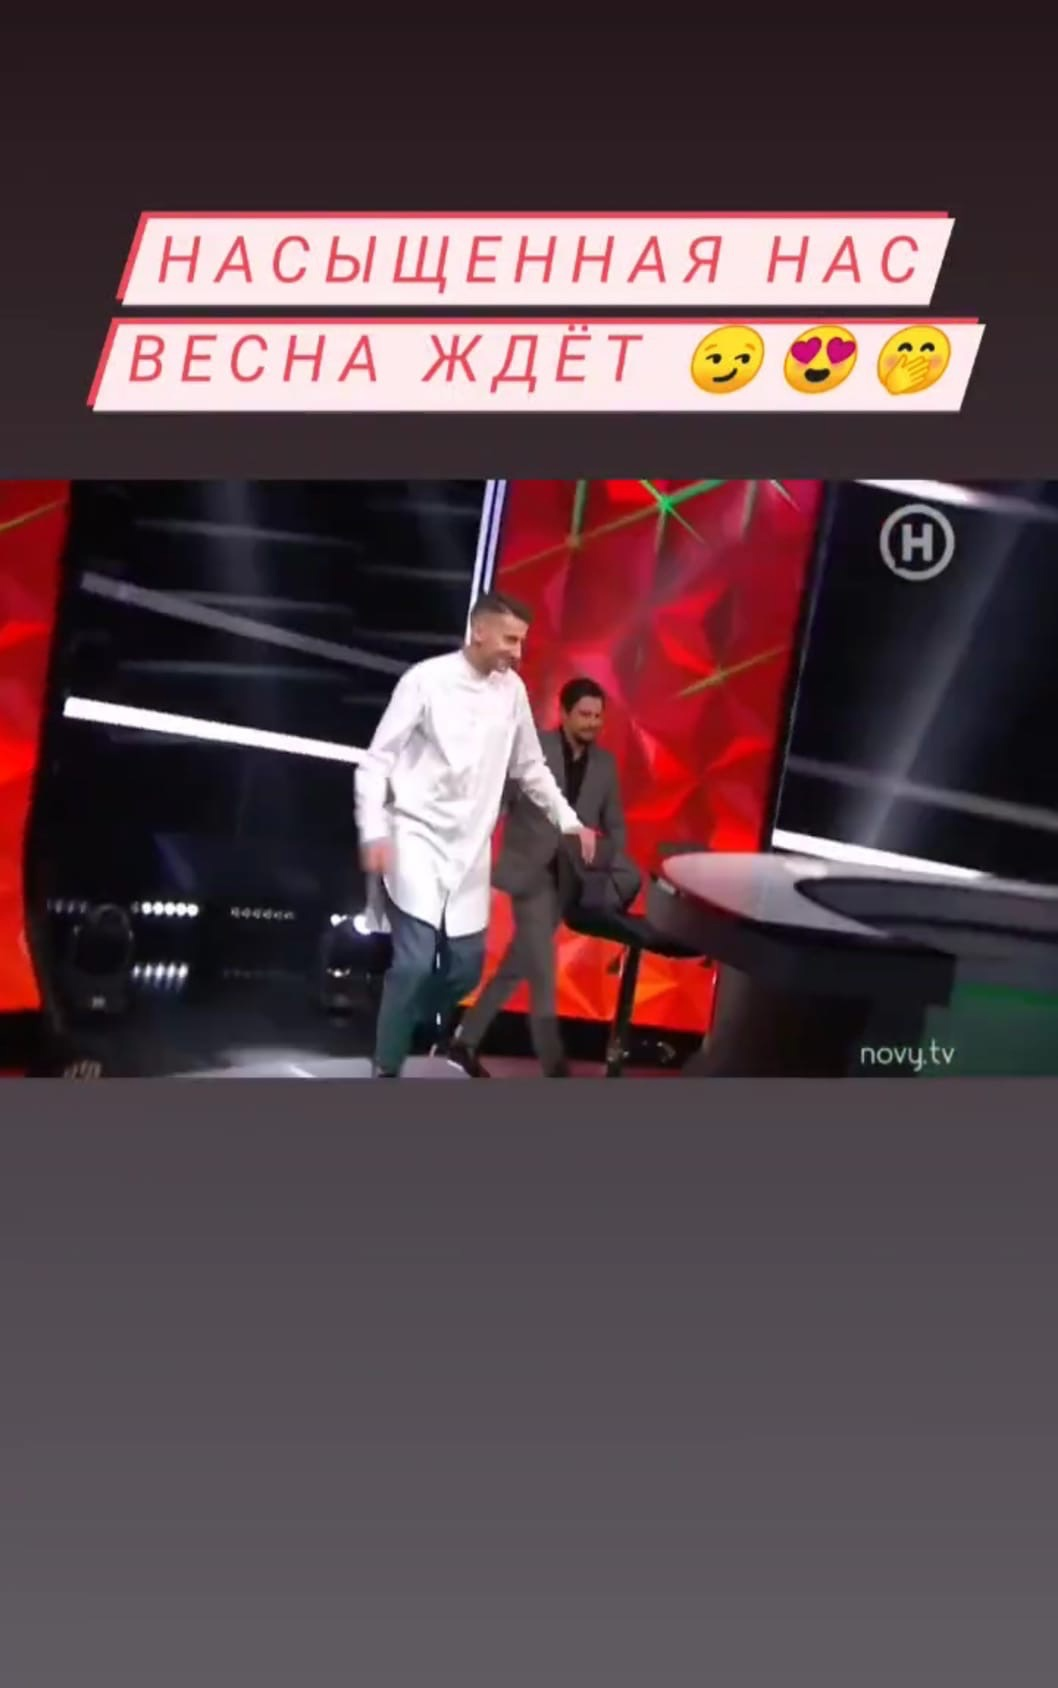 Ksenia Mishina - Sasha Ellert - Bachelorette Ukraine -  Season 1 - Discussion  - Page 6 PMBDUoO3QcM